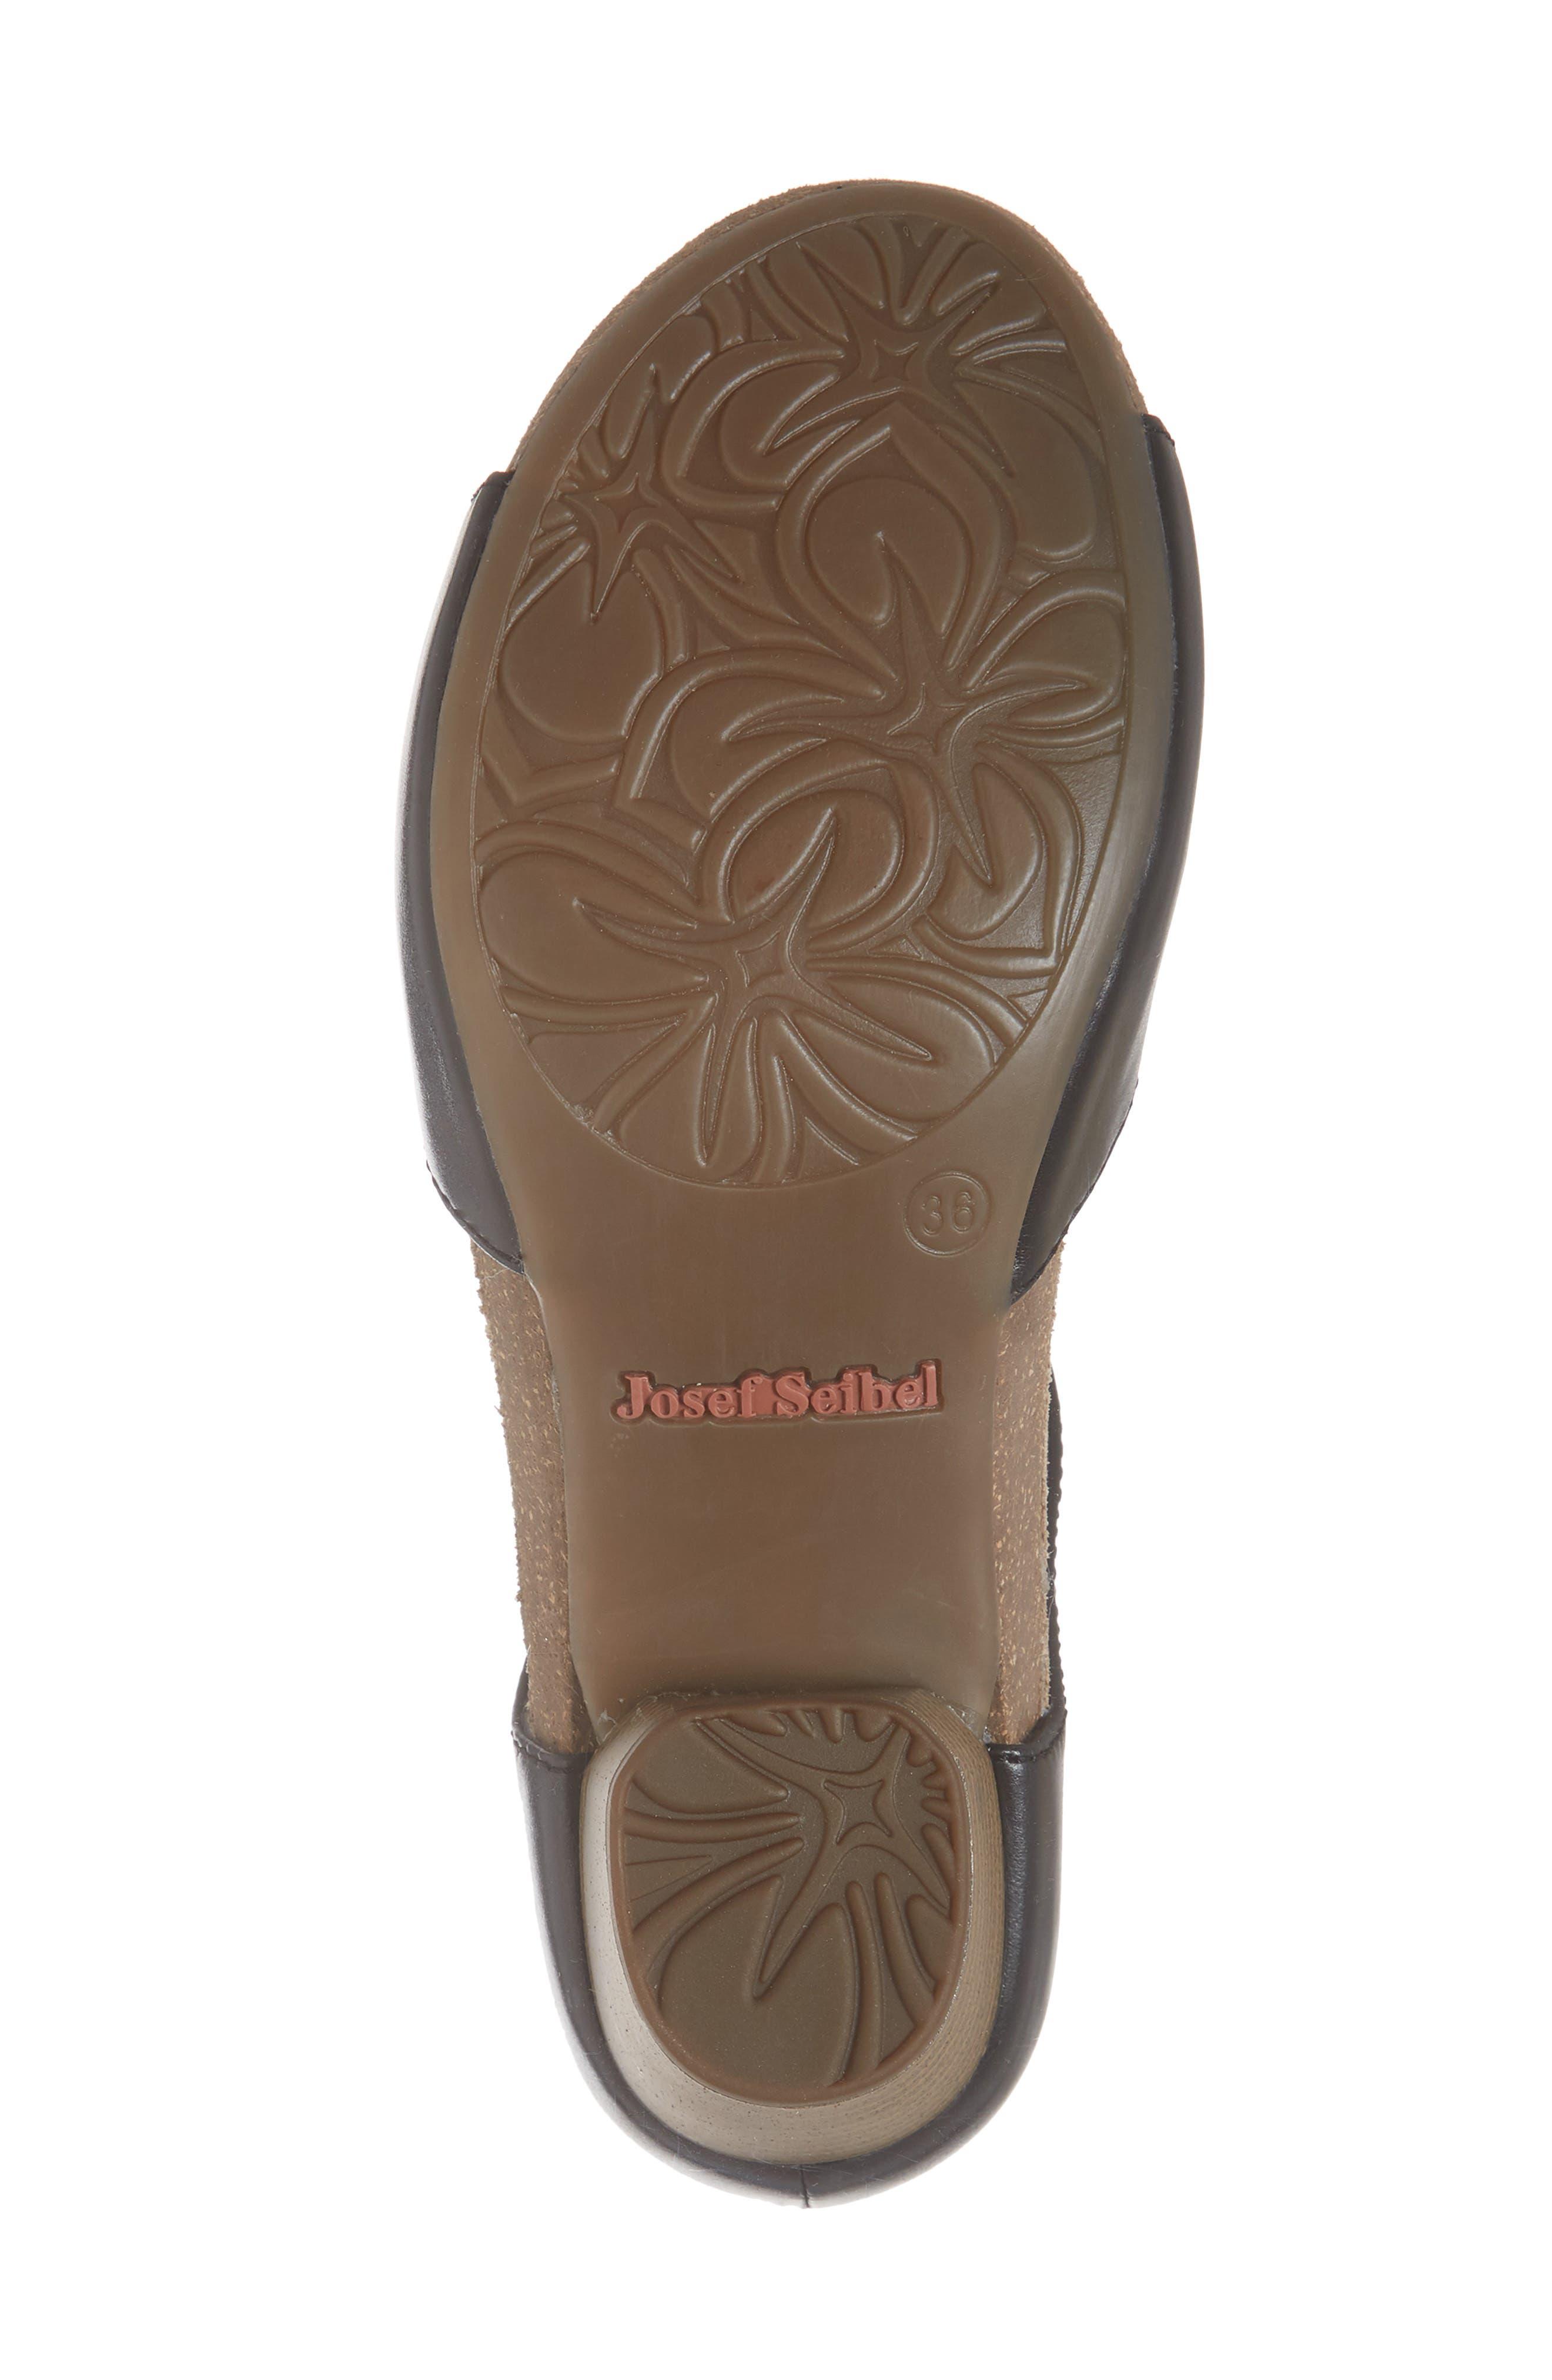 JOSEF SEIBEL,                             Rose 23 Tie Front Sandal,                             Alternate thumbnail 6, color,                             001